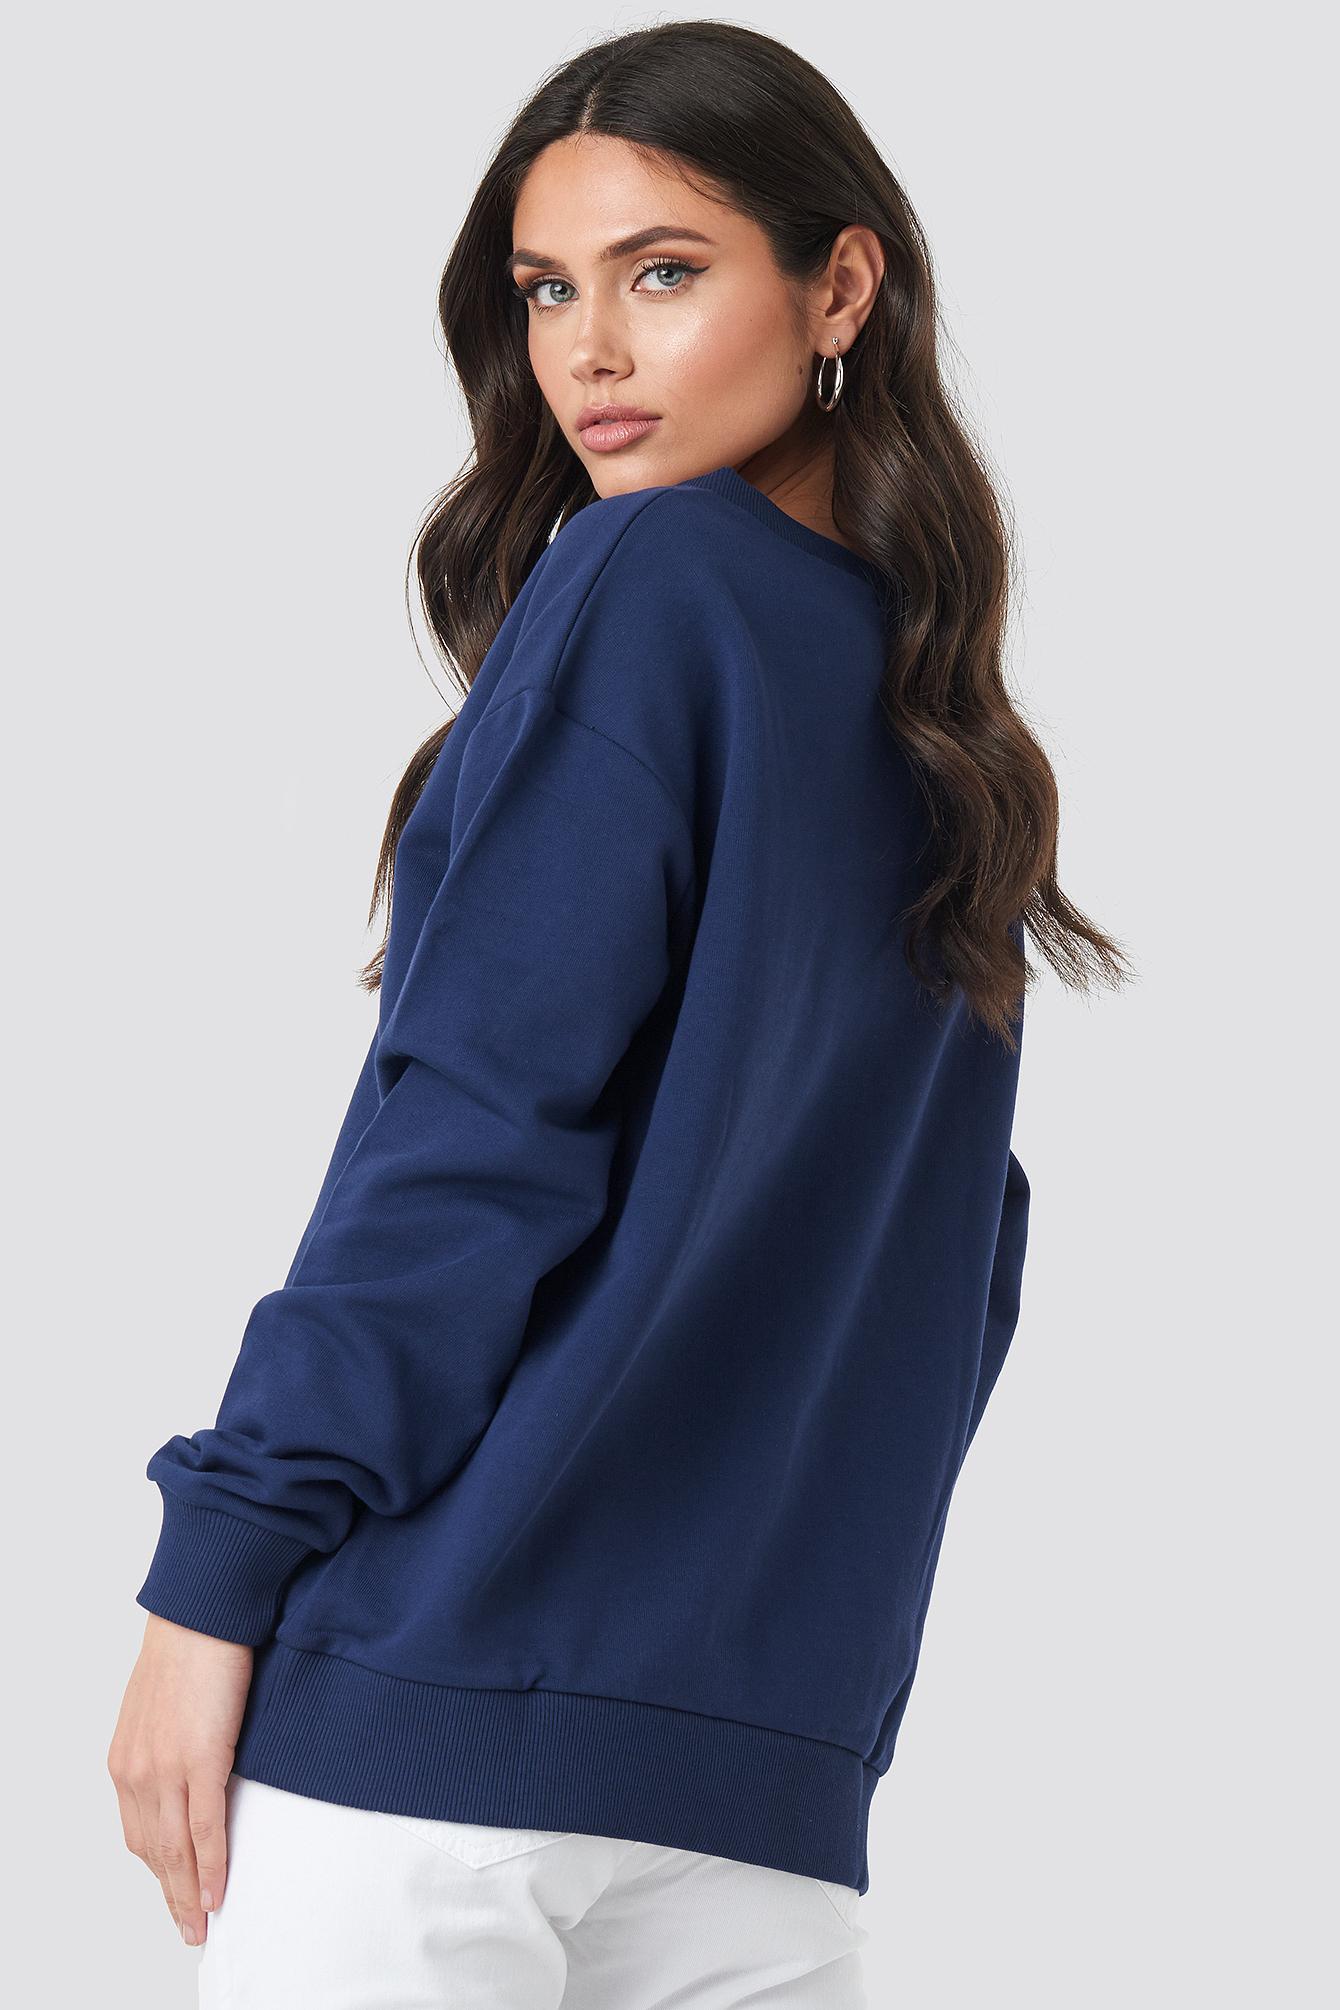 Bluza basic z dekoltem V NA-KD.COM